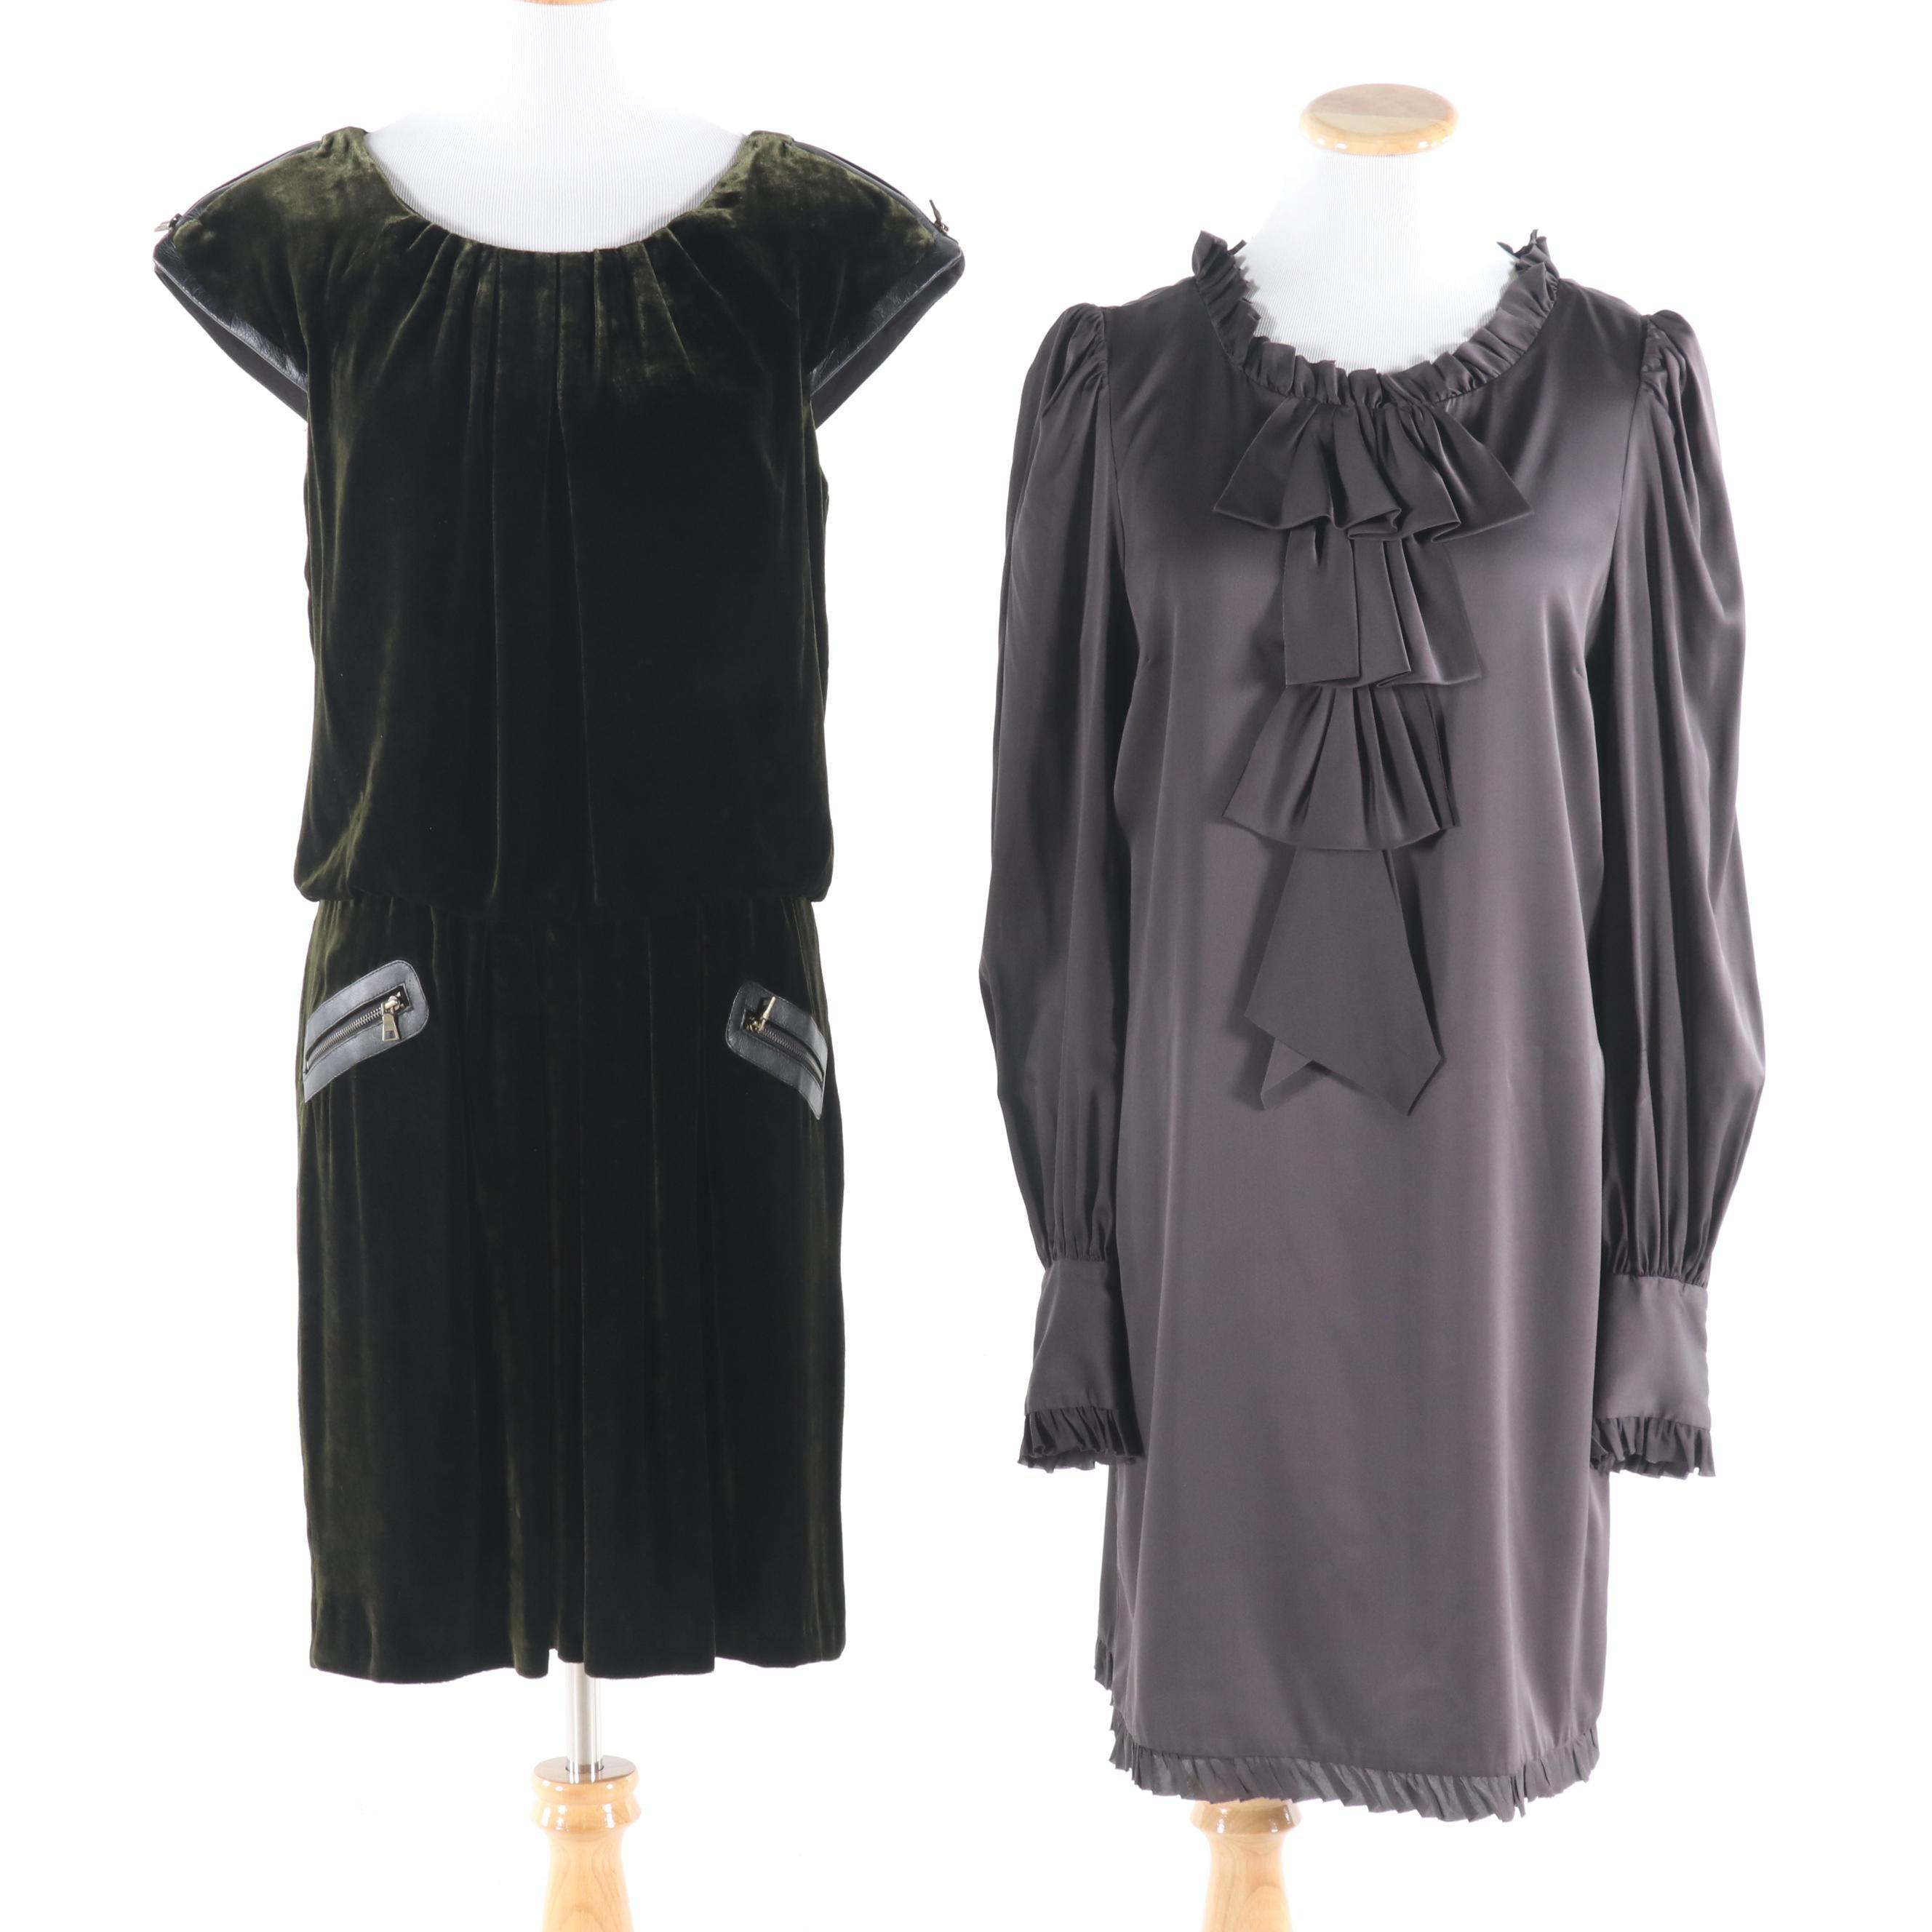 Milly Of New York Gray Silk Charmeuse and Cynthia Steffe Green Velvet Dresses